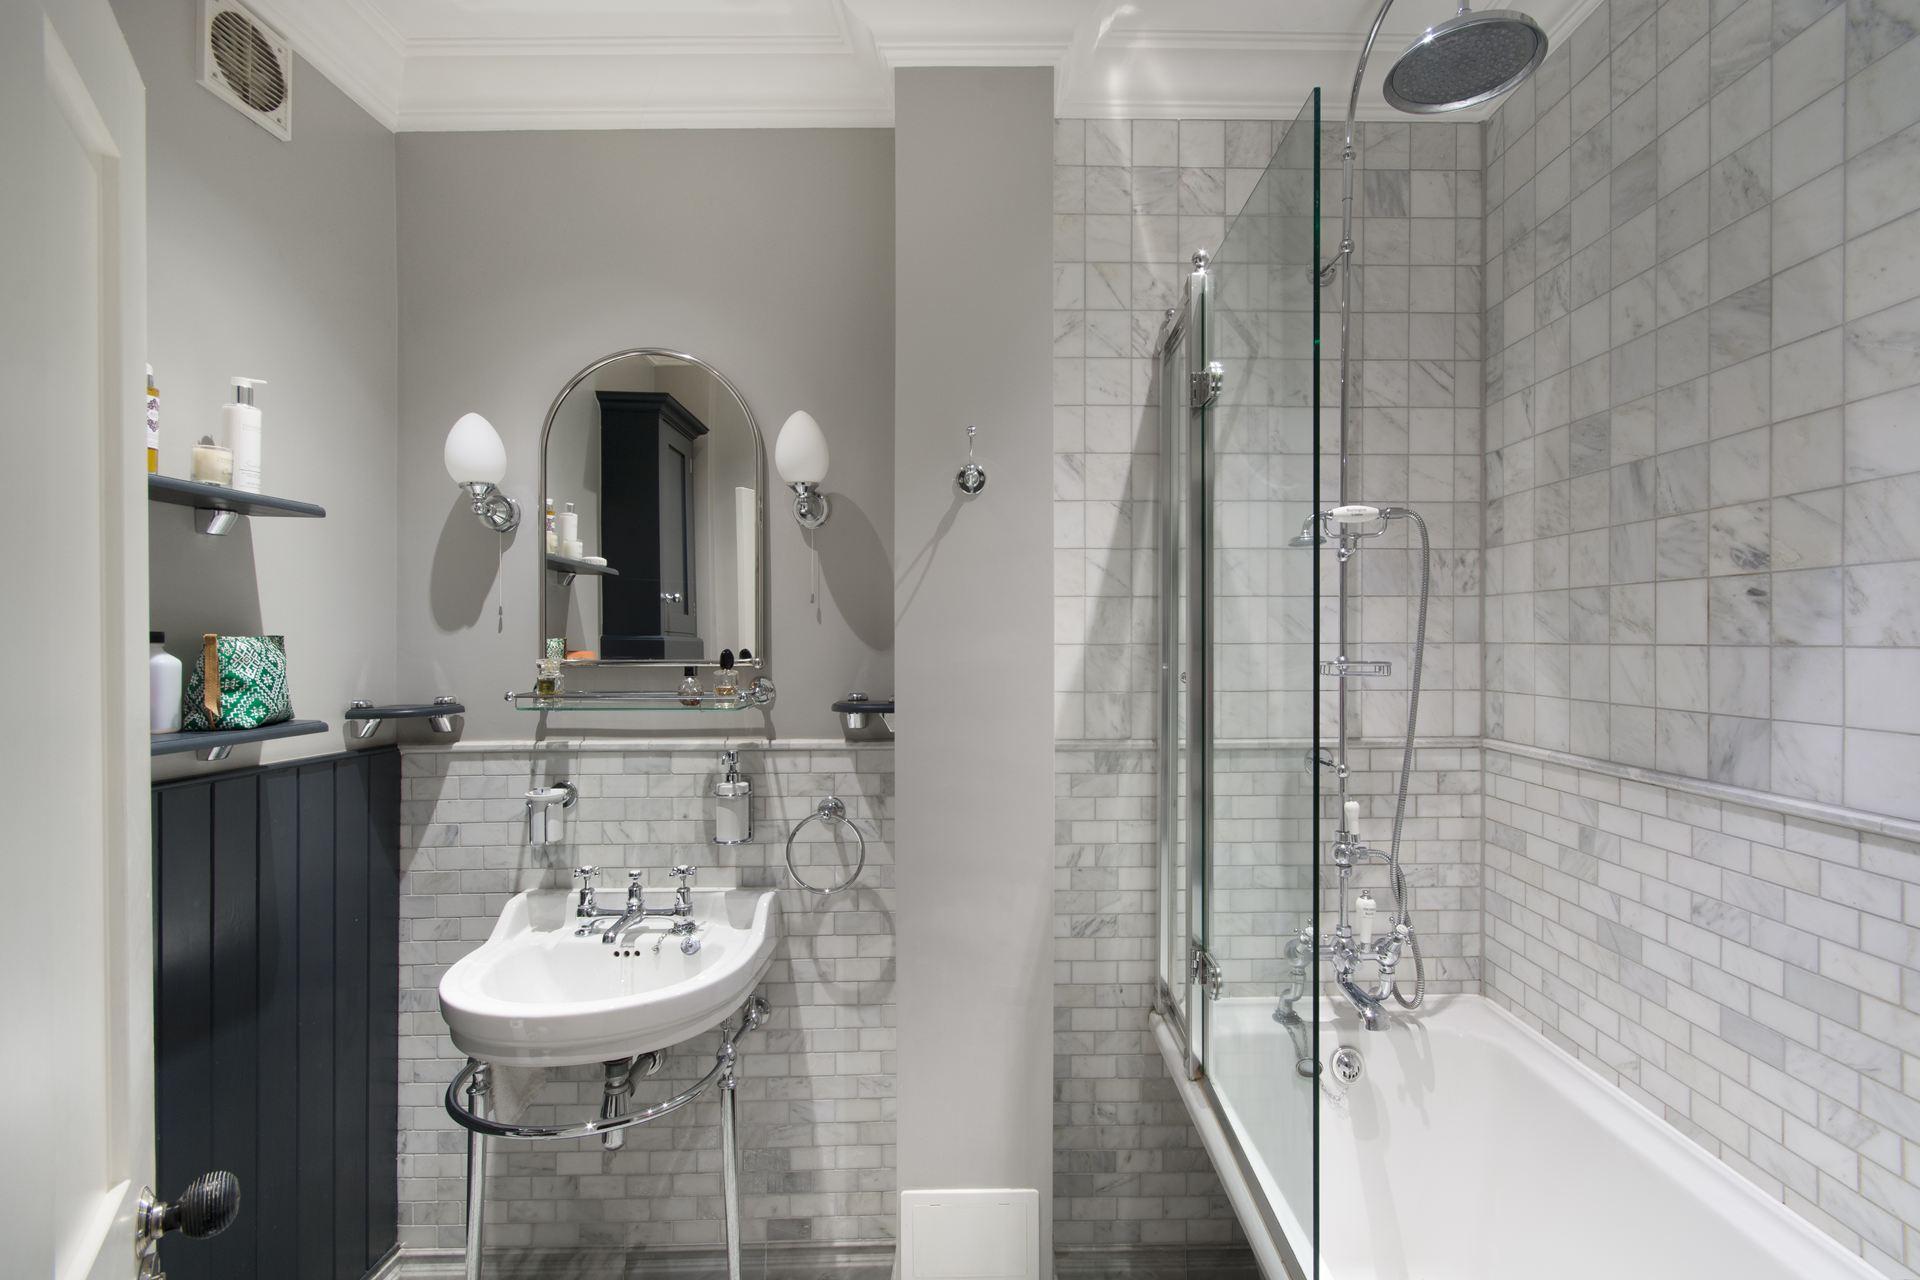 санузел душ ванна раковина зеркало плитка мраморр